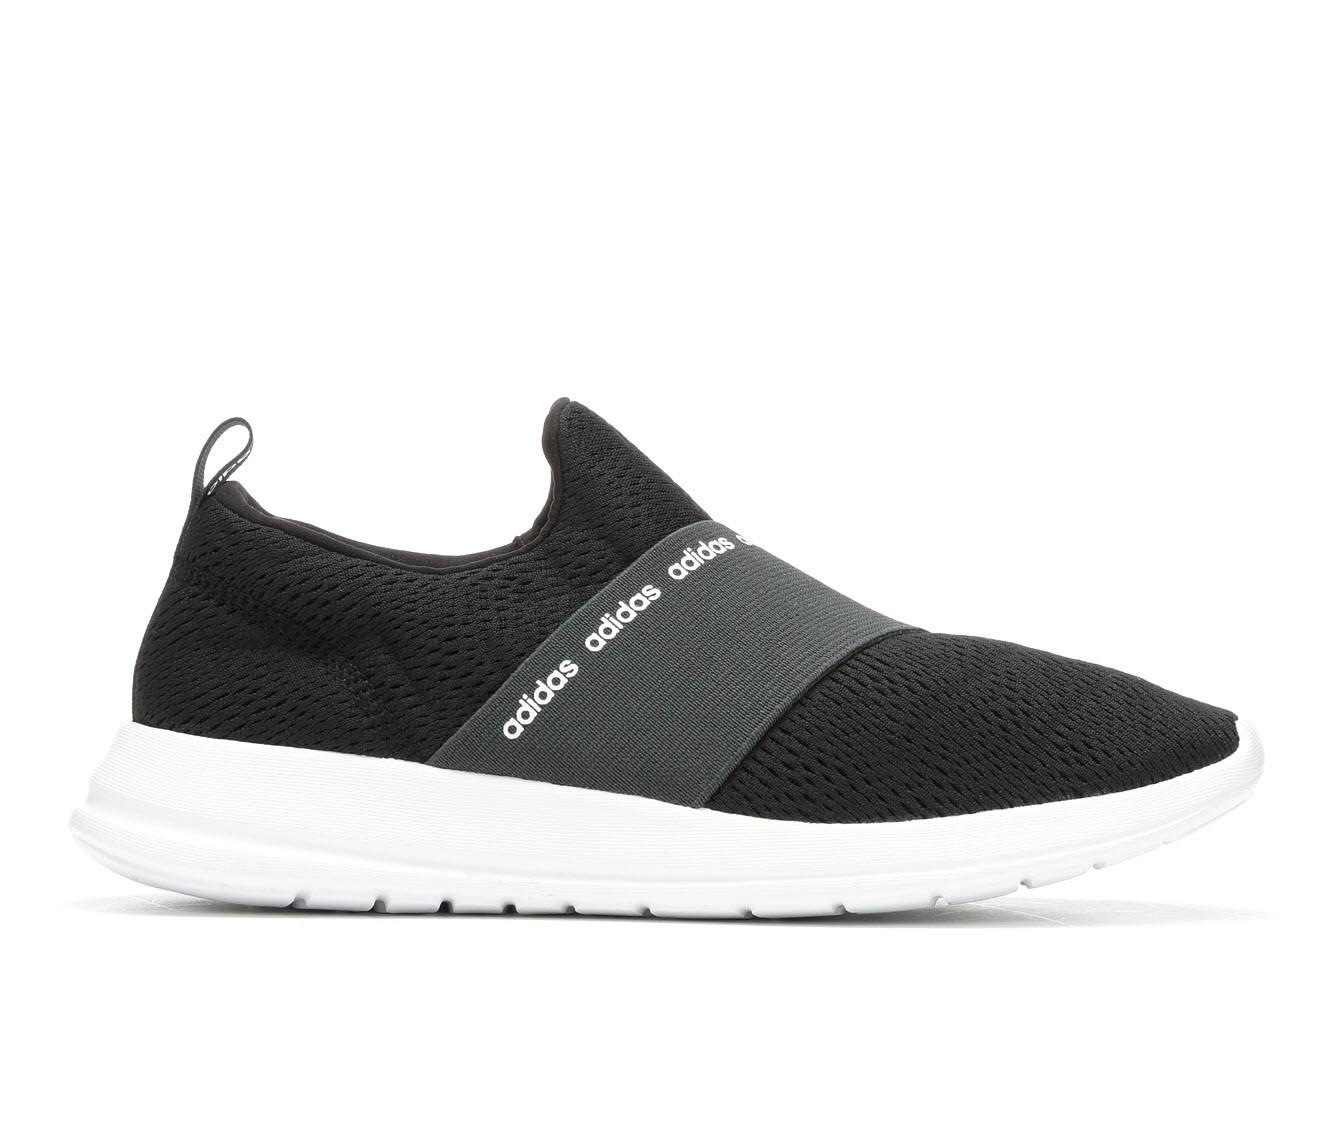 Women's Adidas Refine Adapt Sneakers (Black - Size 5.5) 1715483